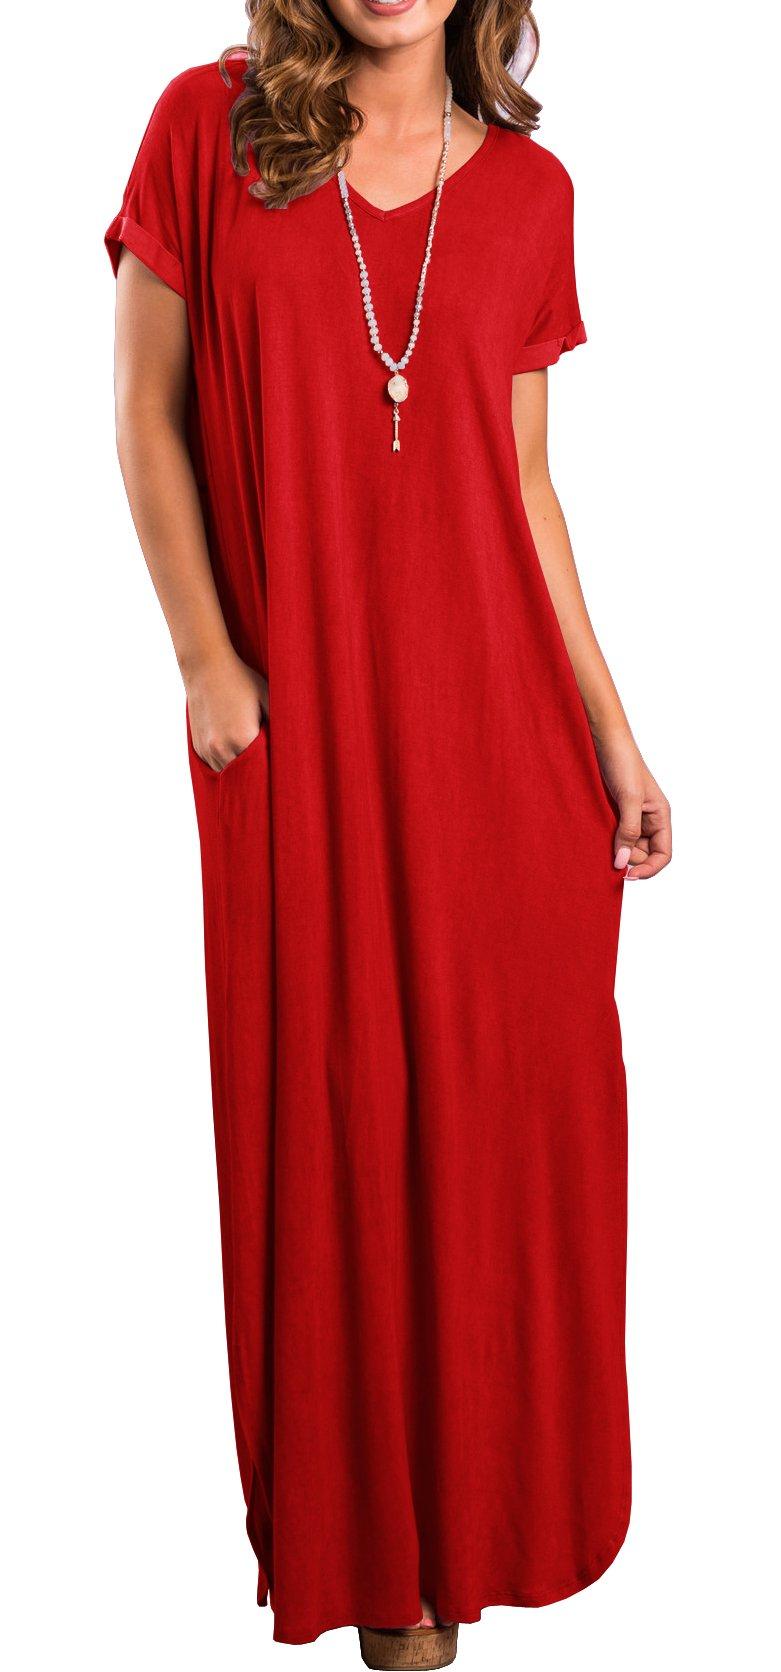 719a455da1cb GRECERELLE Womens Casual V Neck Side Split Beach Long Maxi Dress Red 2XL